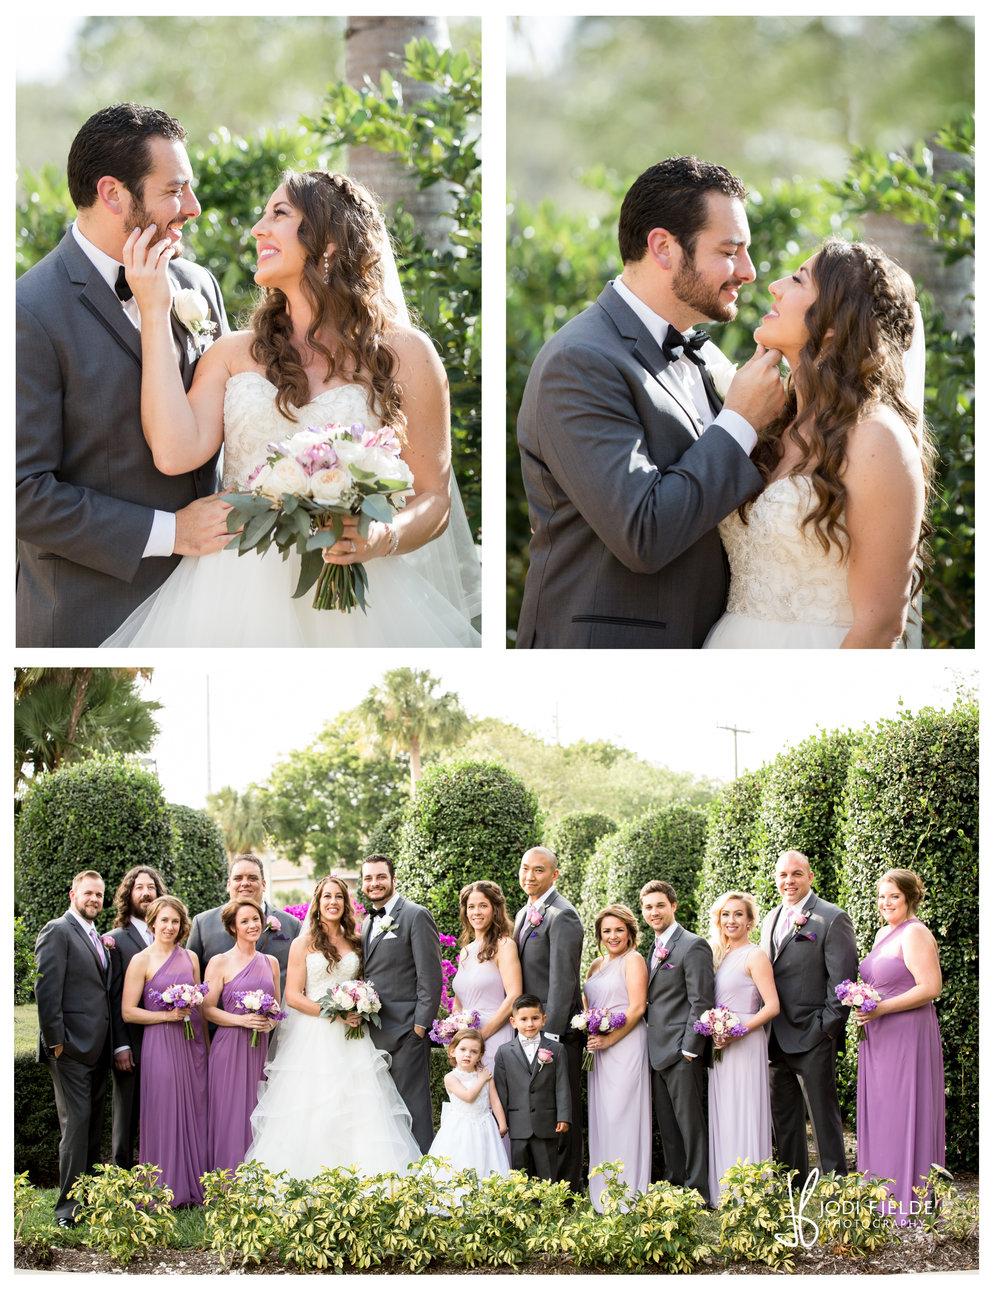 Boynton_Beach_Florida_ Benvenuto_Wedding_Heather__Doug_Married_9.jpg